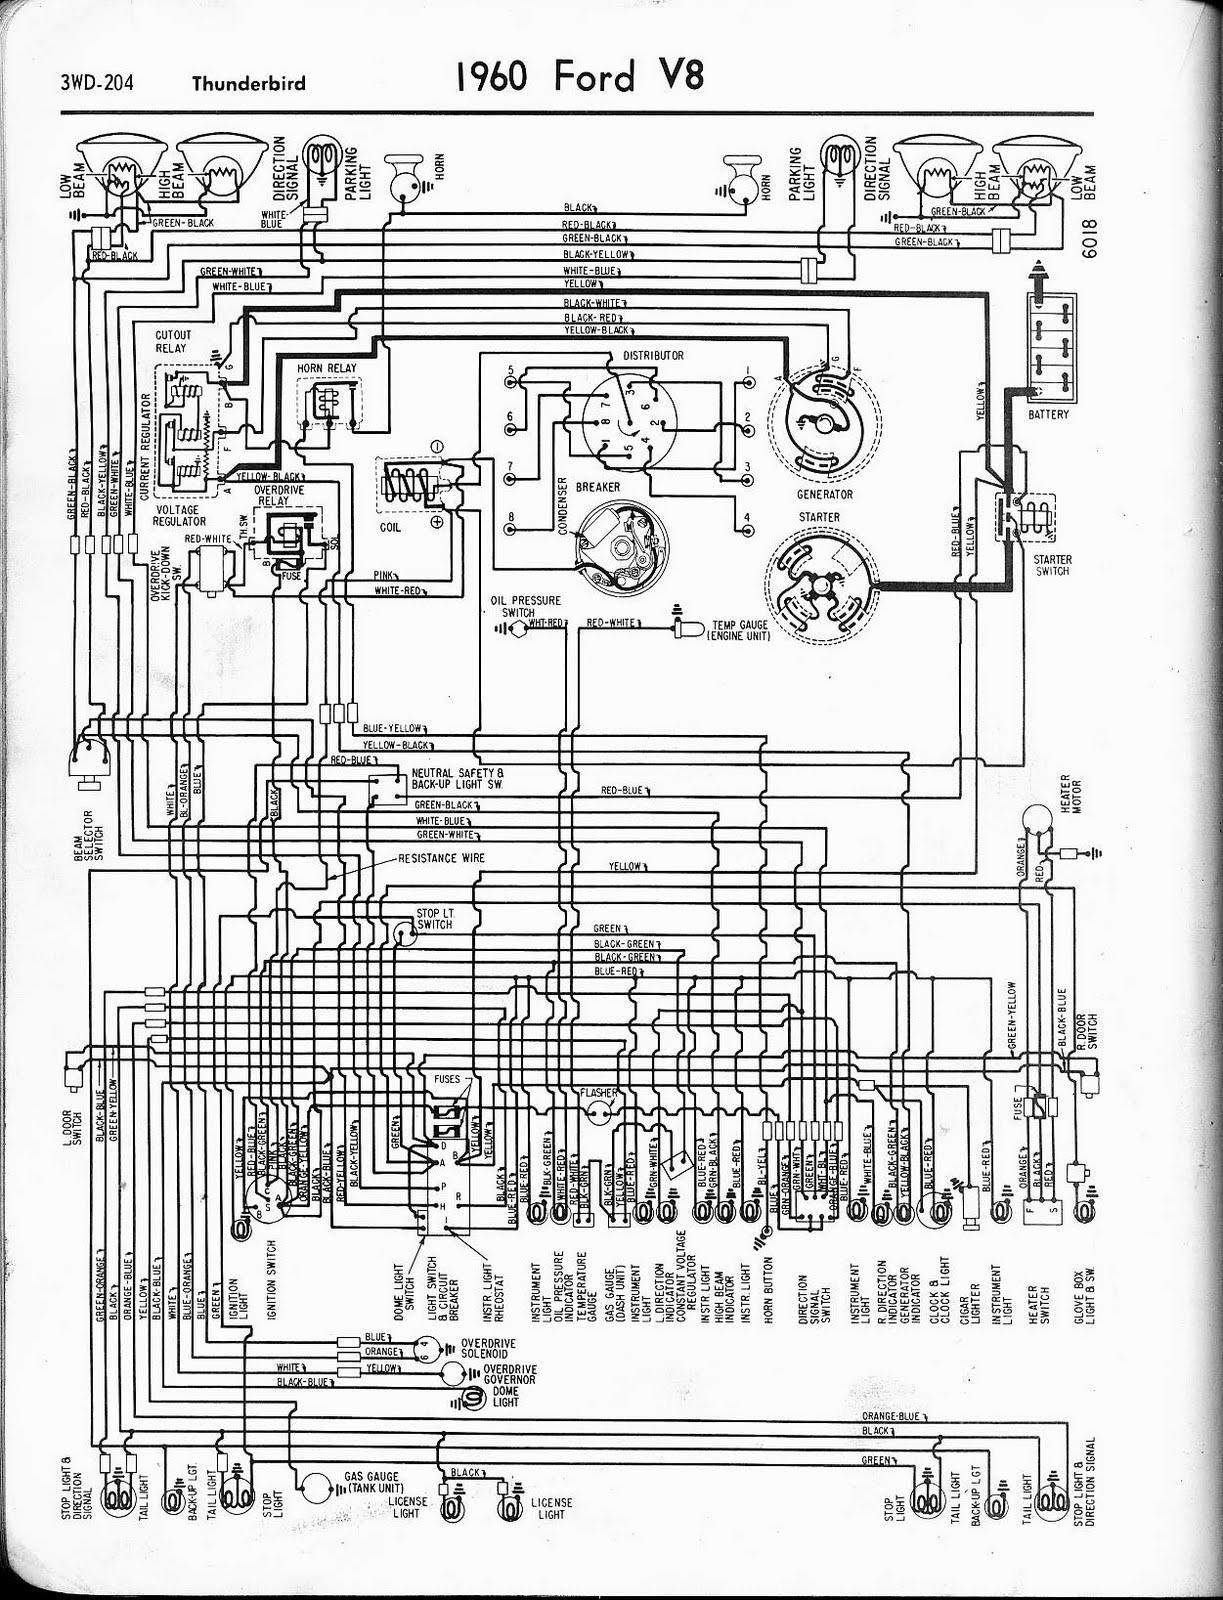 cj lancer wiring diagram spark plug conversion chart free auto april 2011